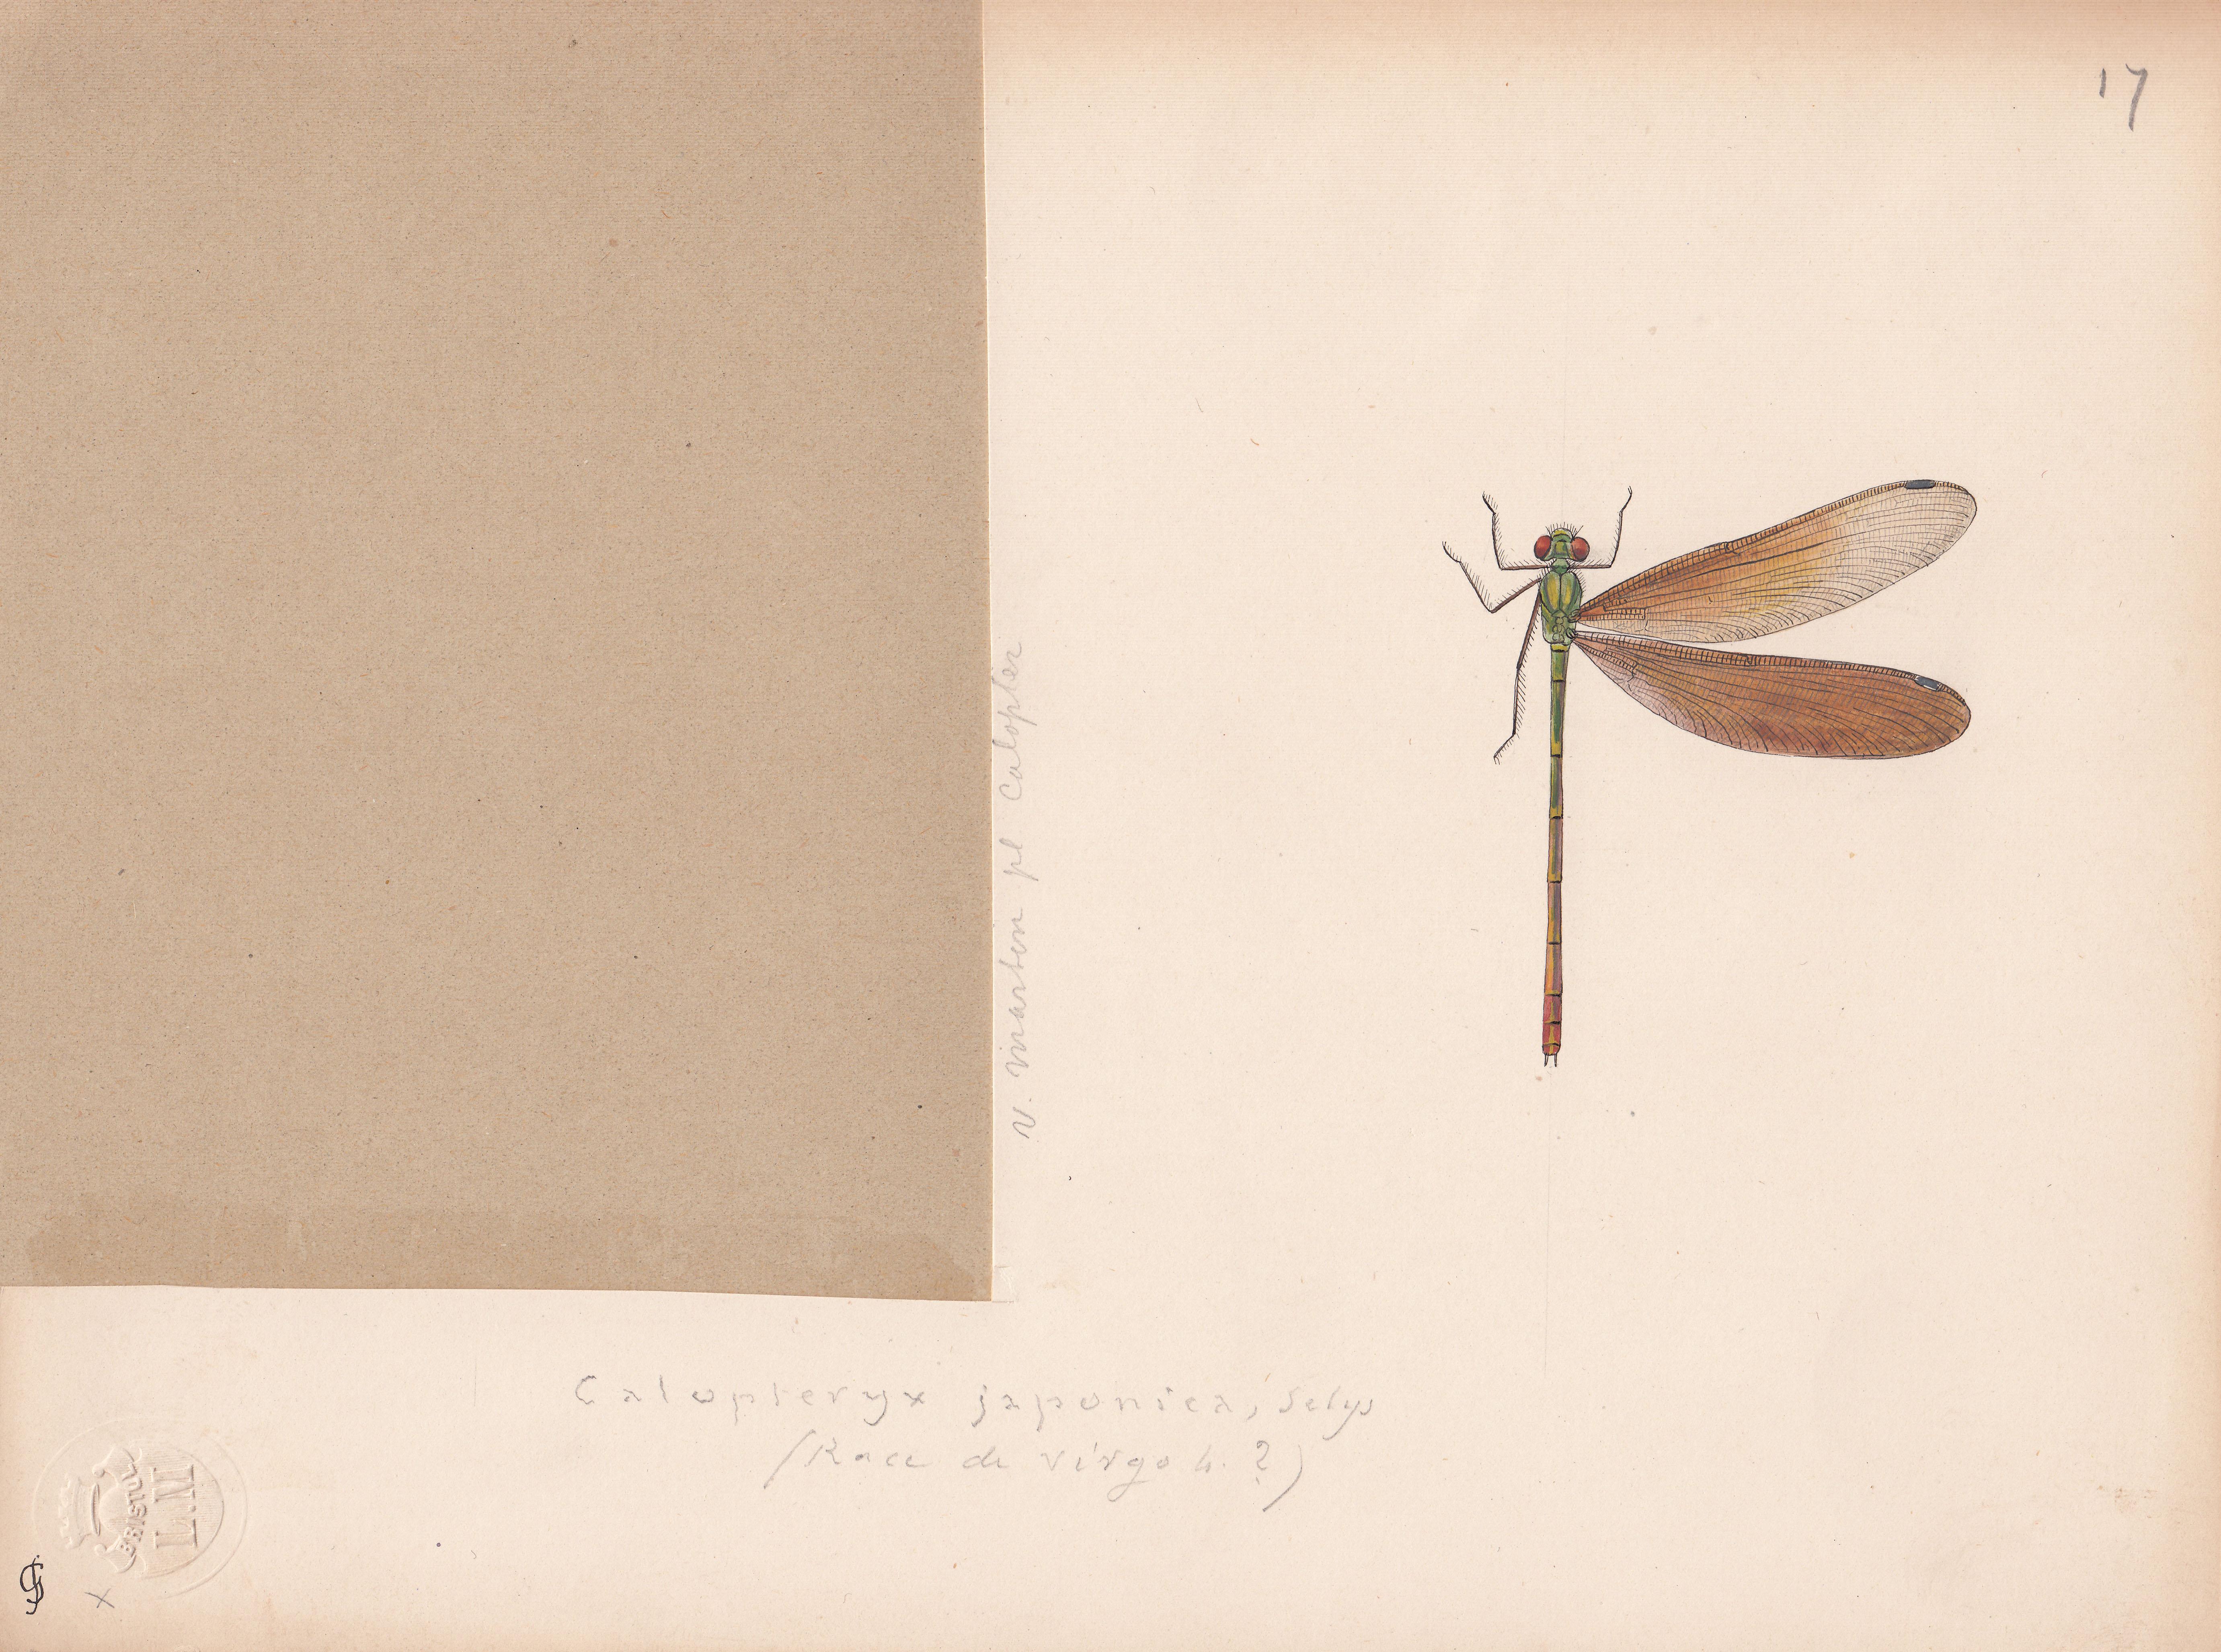 Calopteryx japonica.jpg